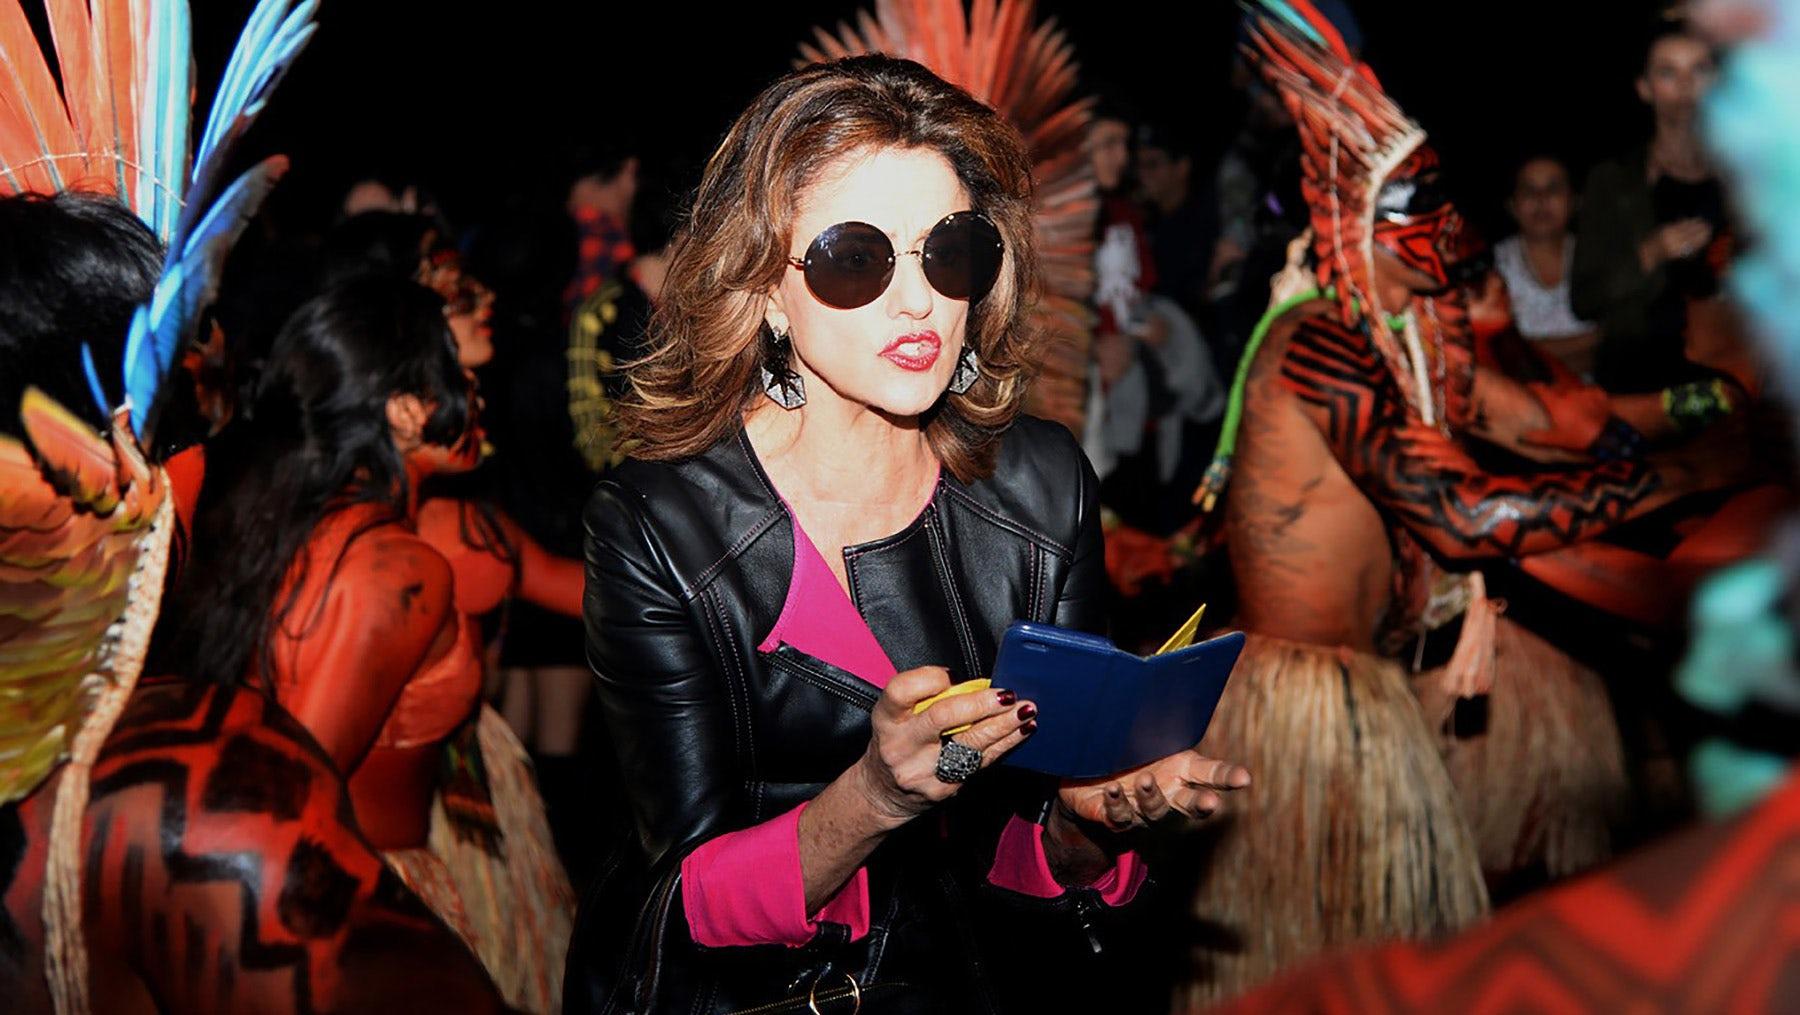 Brazil's Soap Stars Stir Passion for Fashion Brands